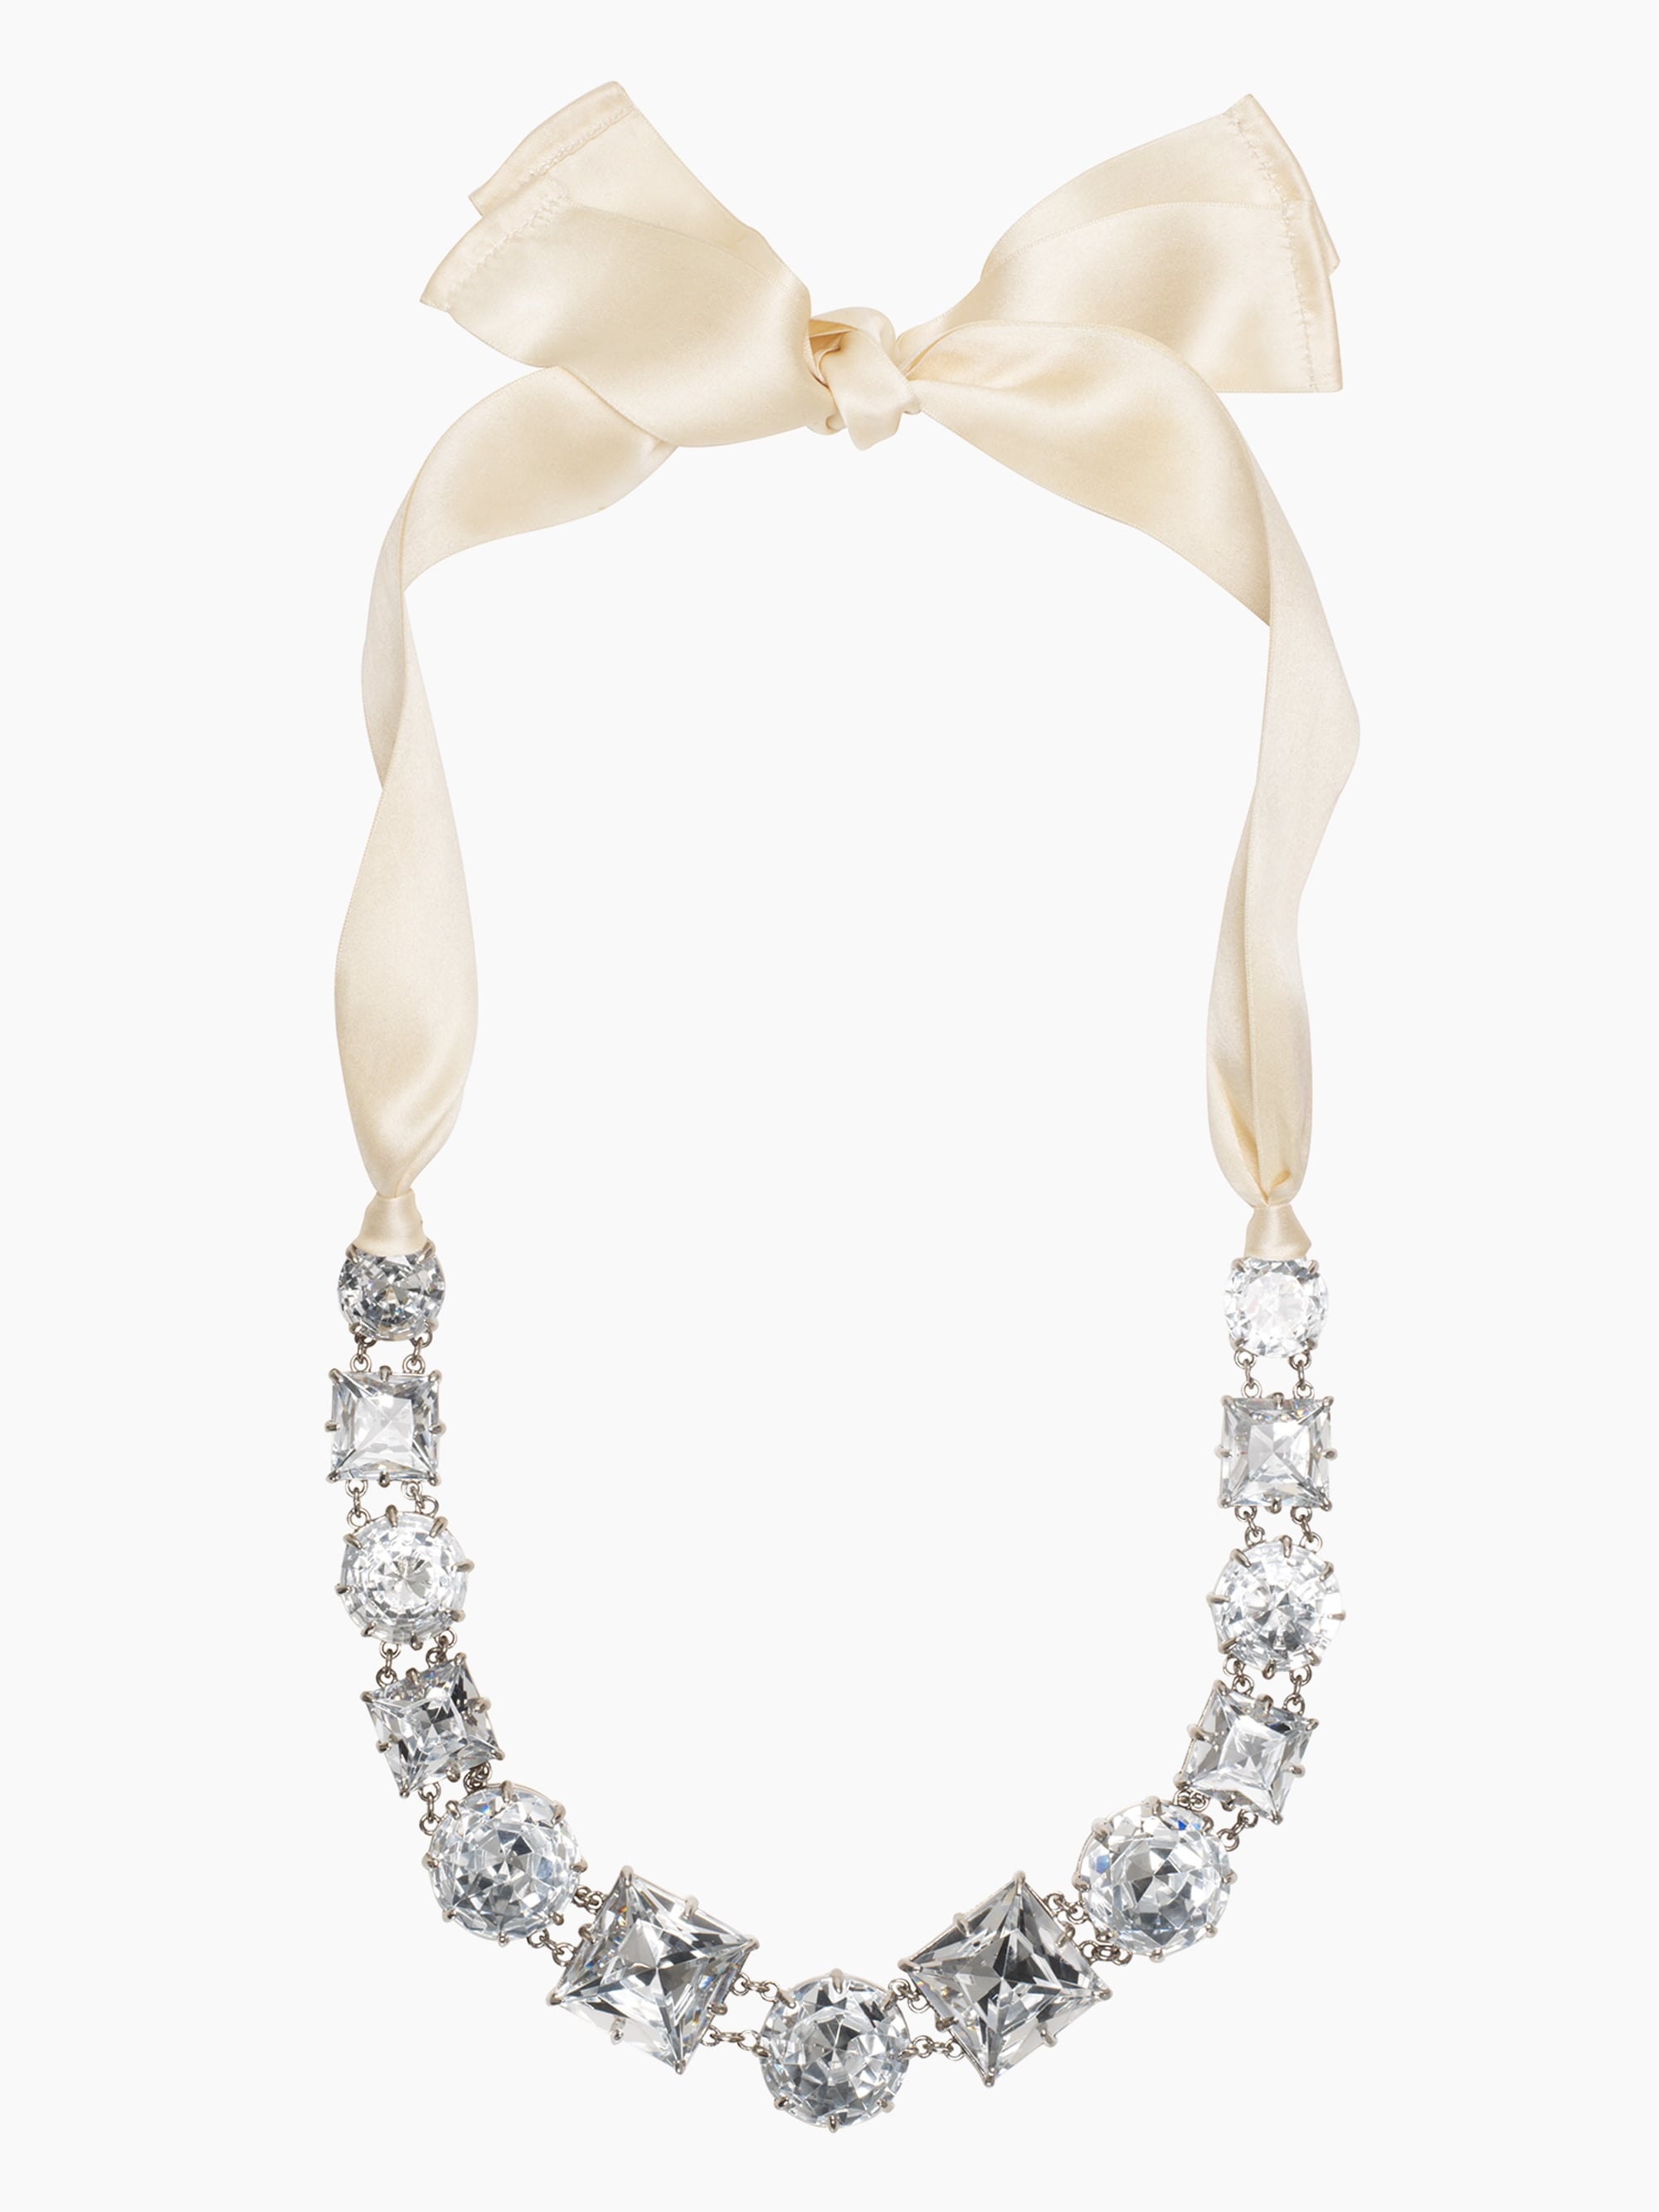 Kate Spade New York Crystal Kaleidoscope Necklace With Ribbon Tie ($129, originally $295)